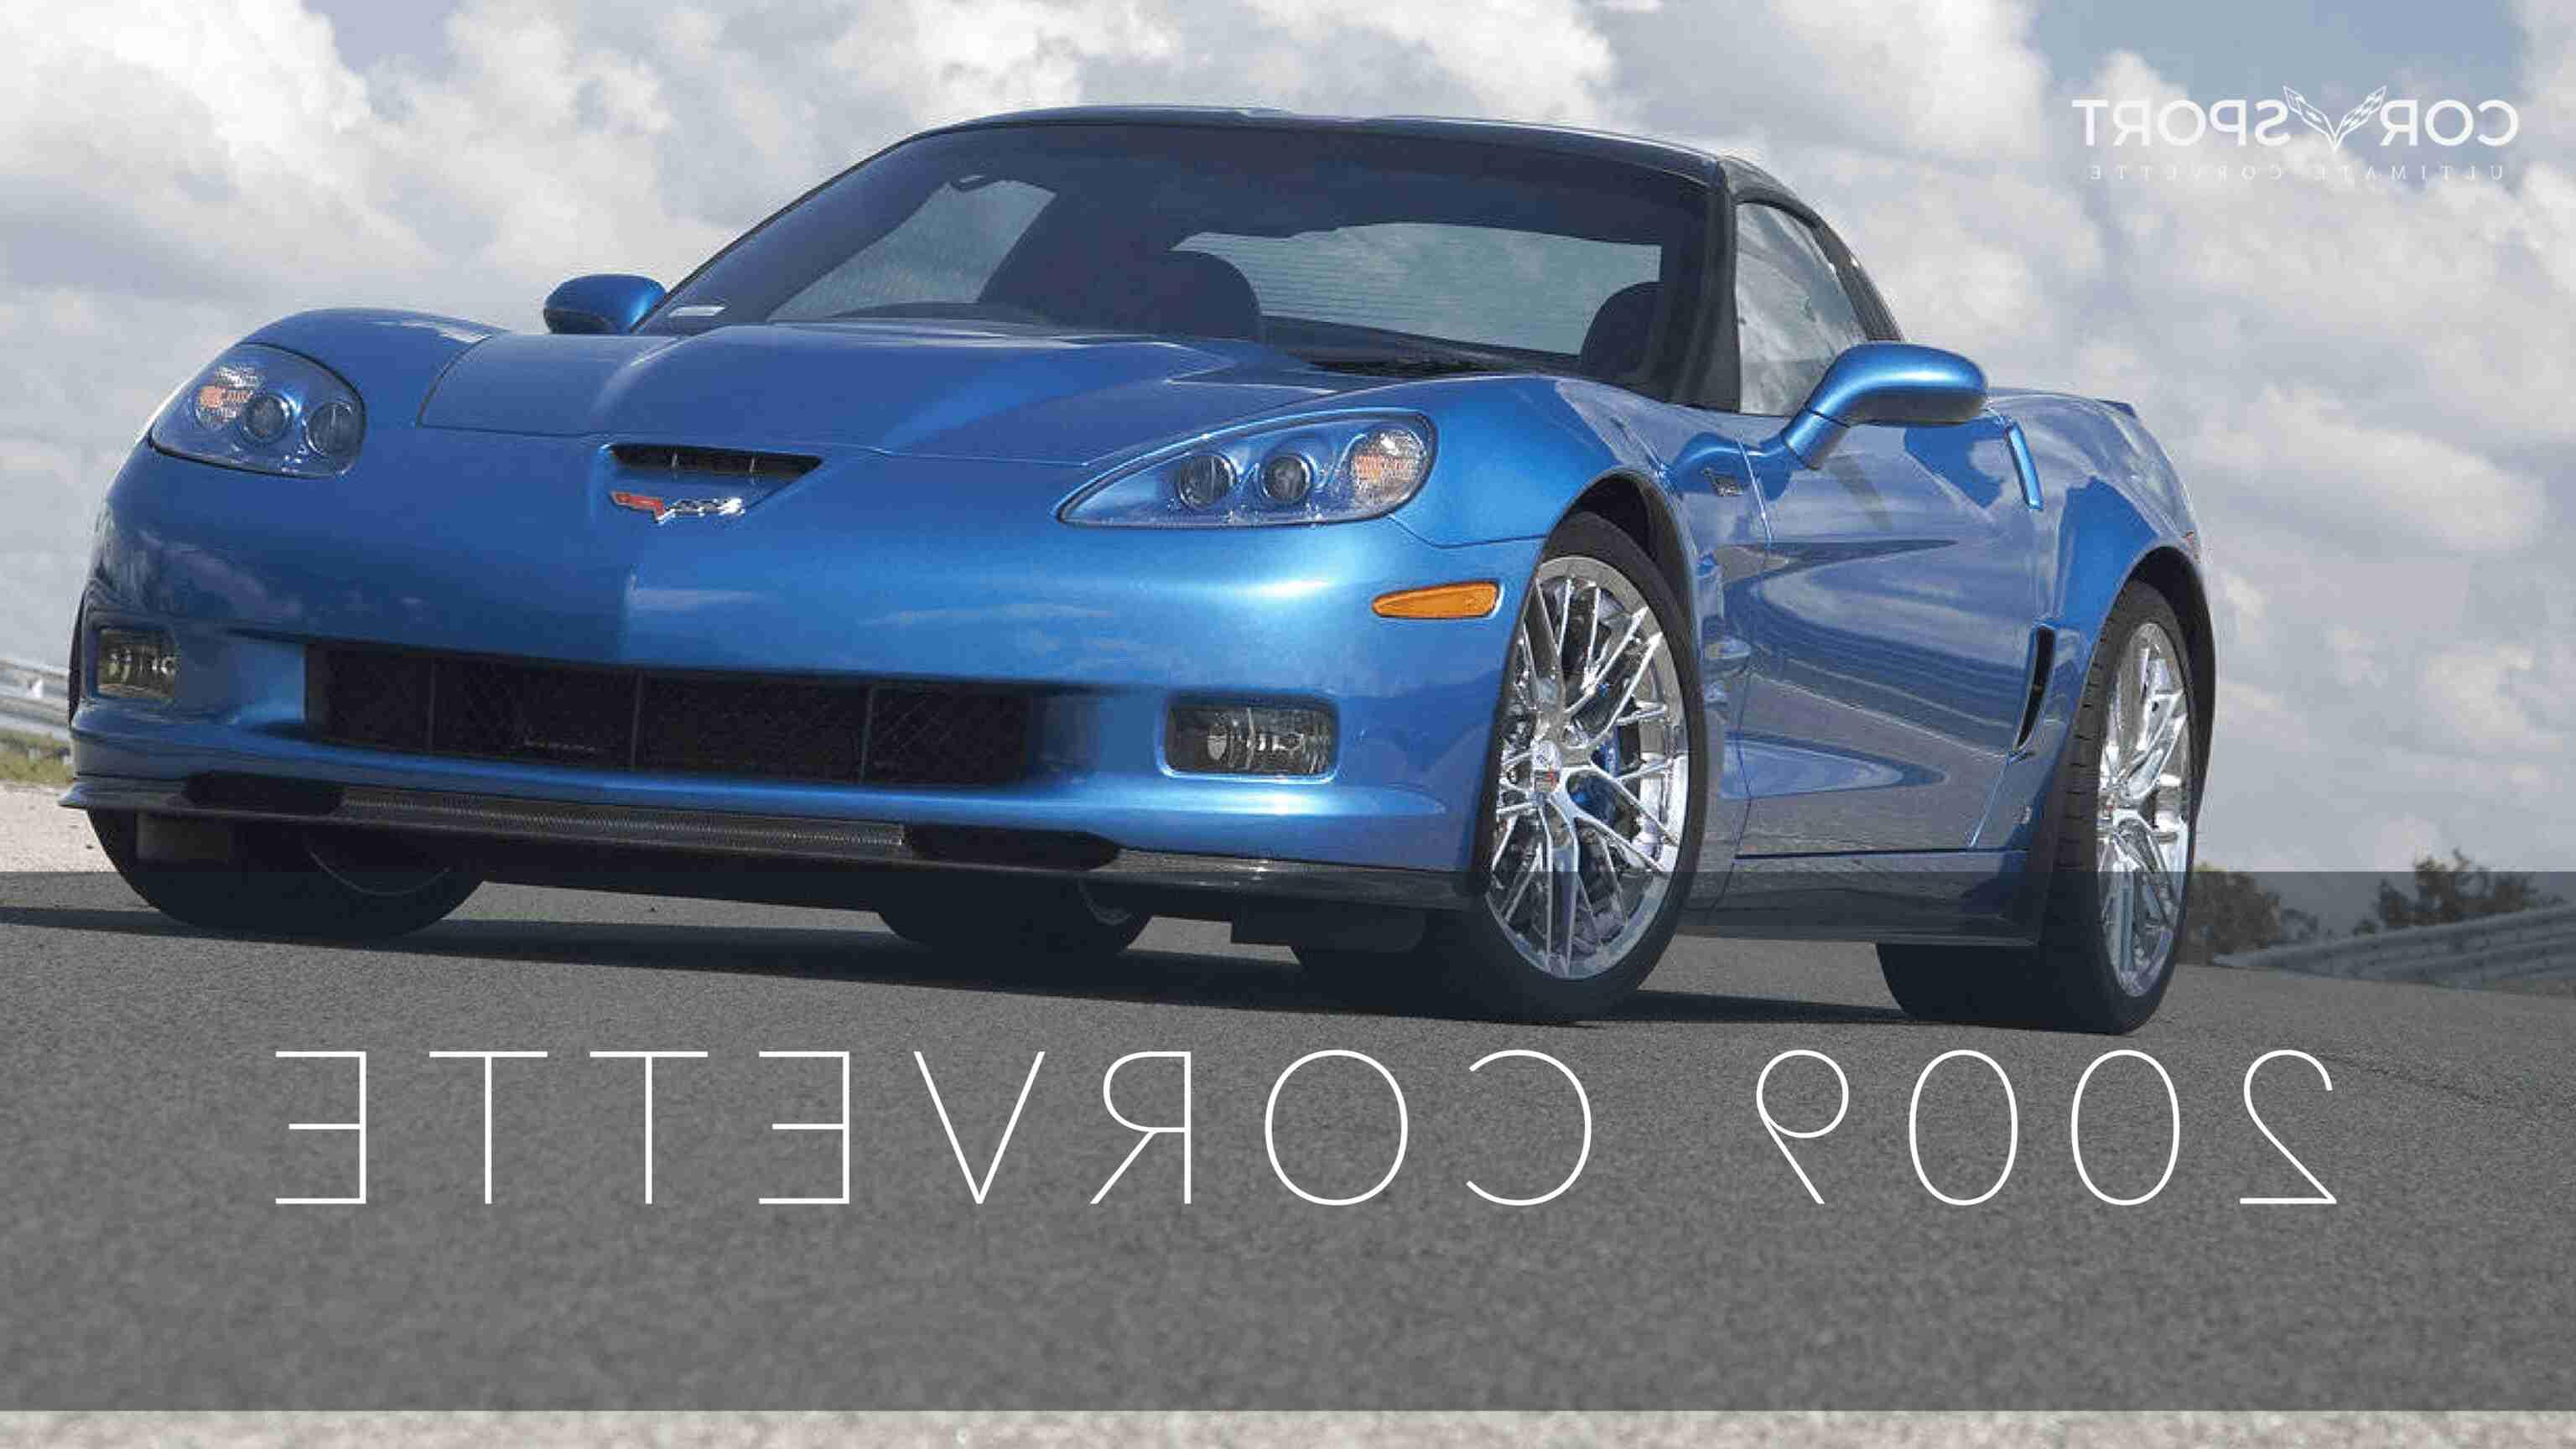 2009 c6 corvette for sale